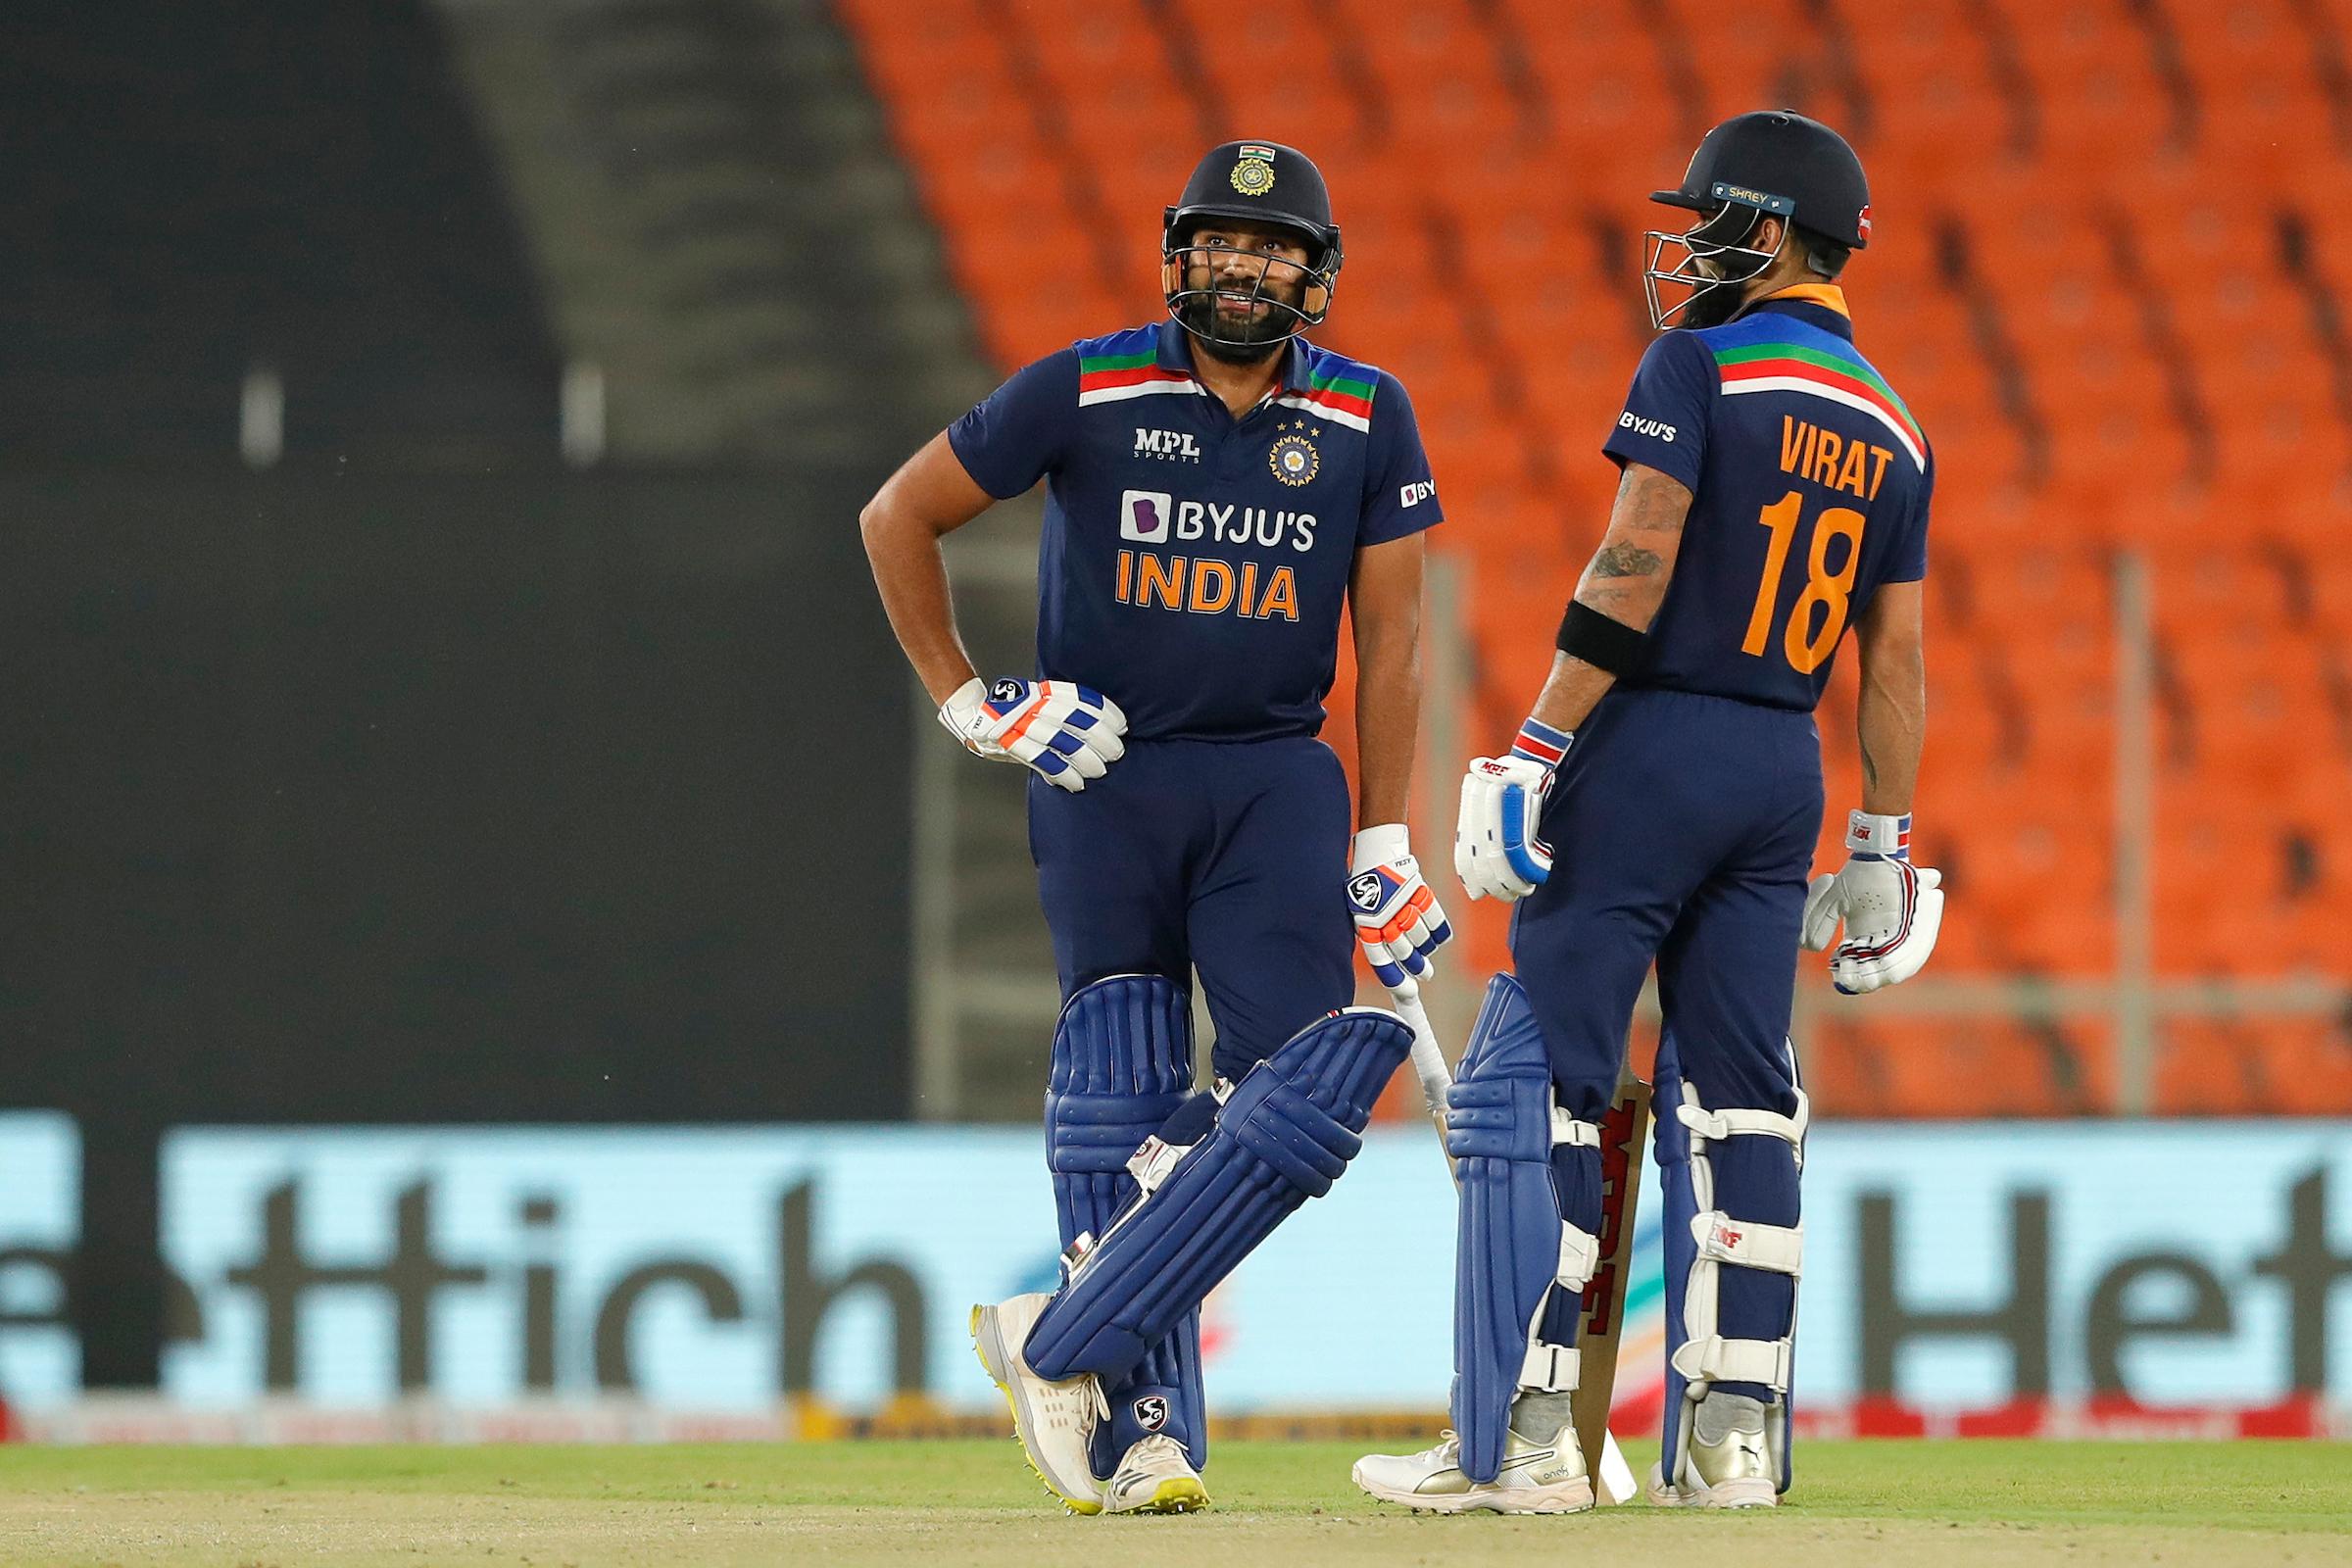 Kohli, Rohit advances in MRF Tires ICC male T20I player rankings